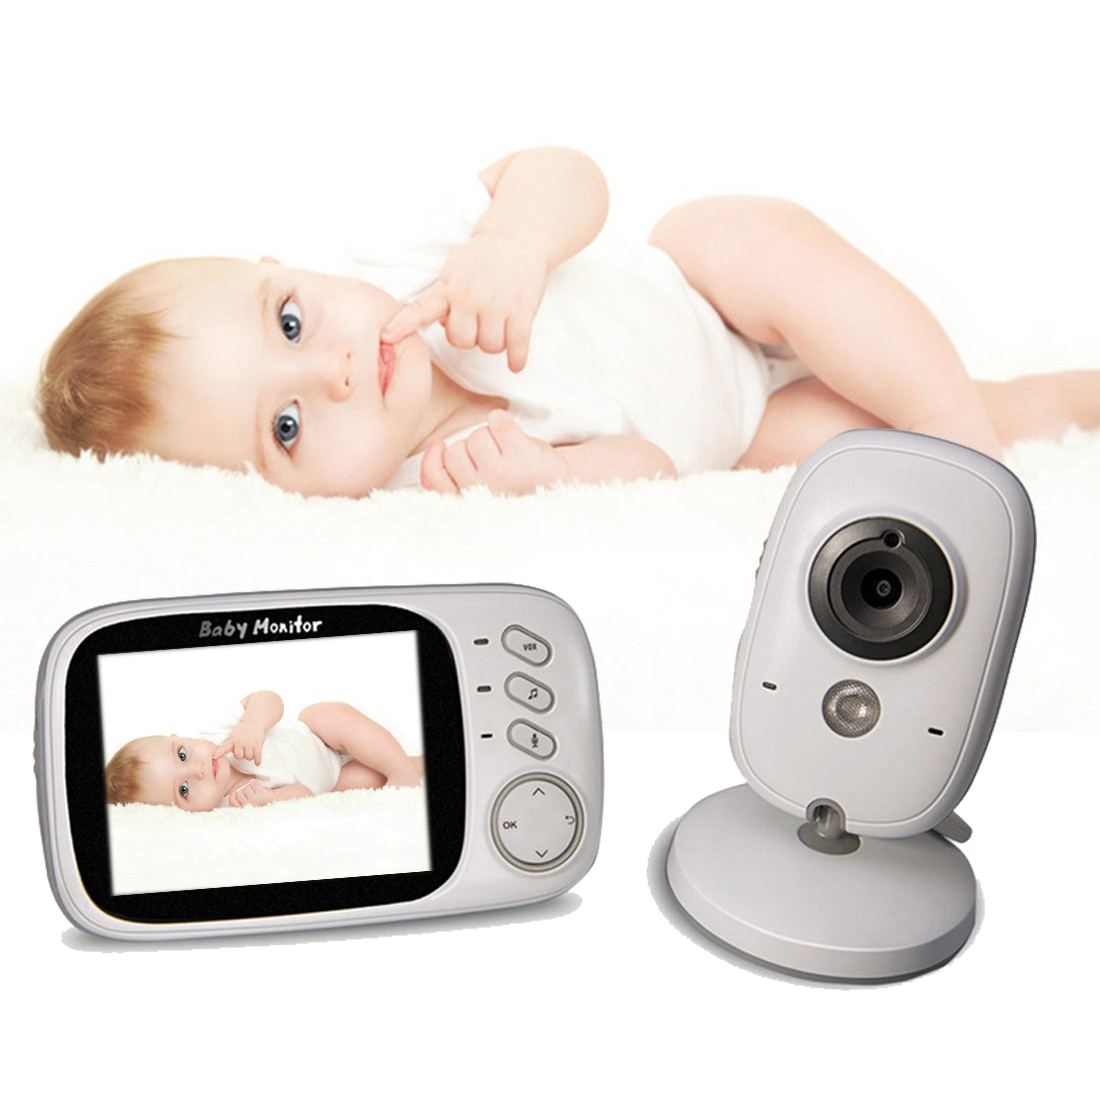 Nanny video 2,4 GHz 3,2 inch LCD Display Wireless Baby Monitor Video mit Nachtsicht Baby Phone Audio Monitor Elektronische nanny